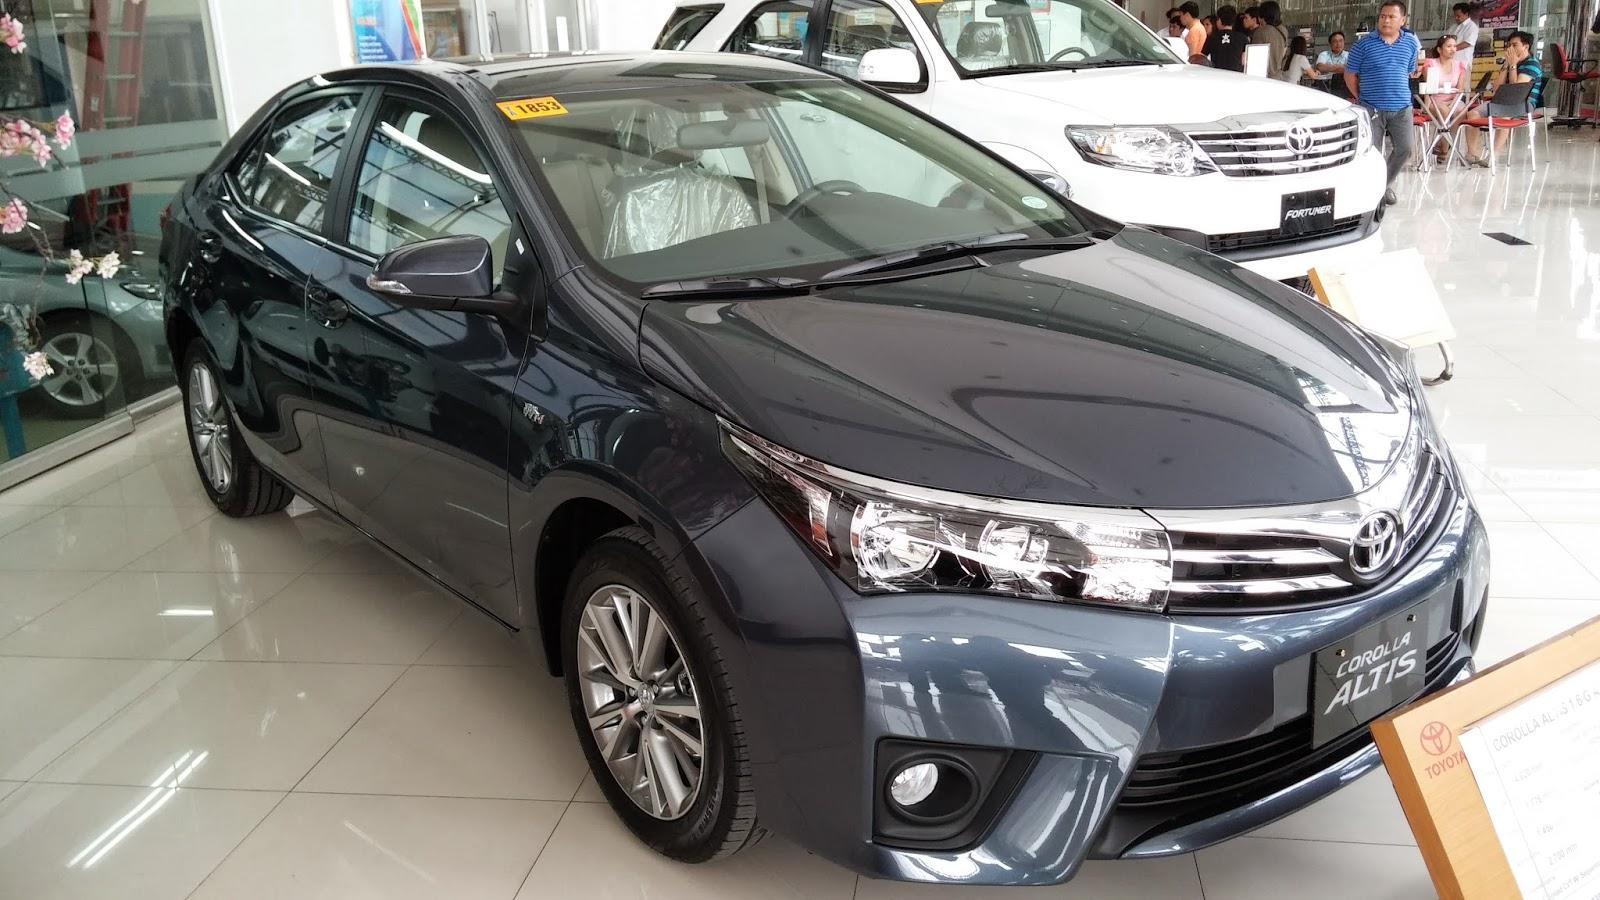 All New Camry Logo Tipe Dan Harga Kijang Innova Toyota Corolla Altis 2014 Lakbay Atbp